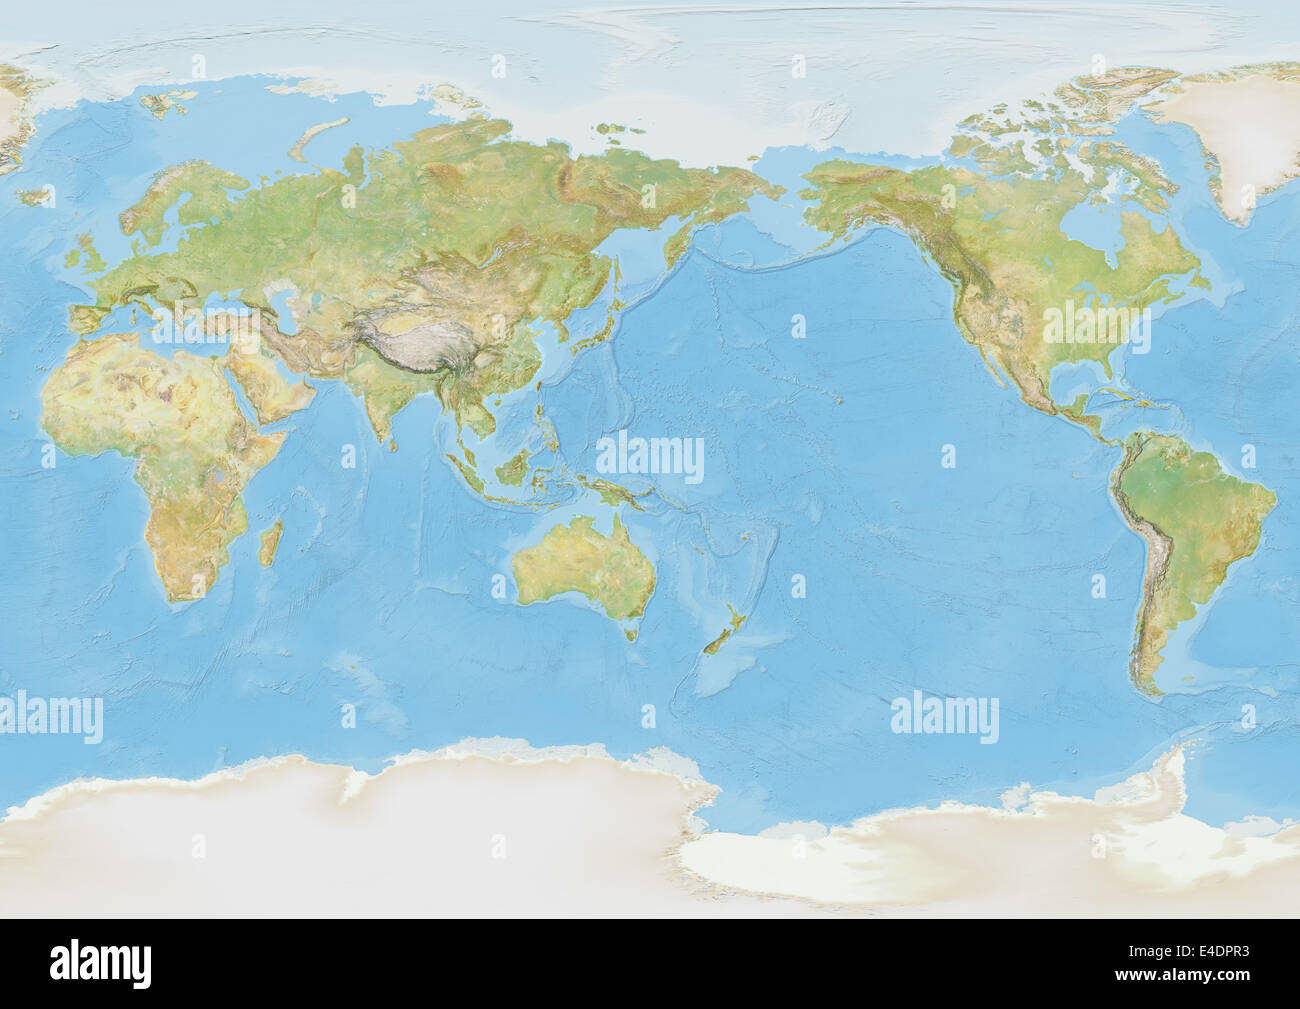 Arctic Ocean On Map Stockfotos & Arctic Ocean On Map Bilder - Alamy